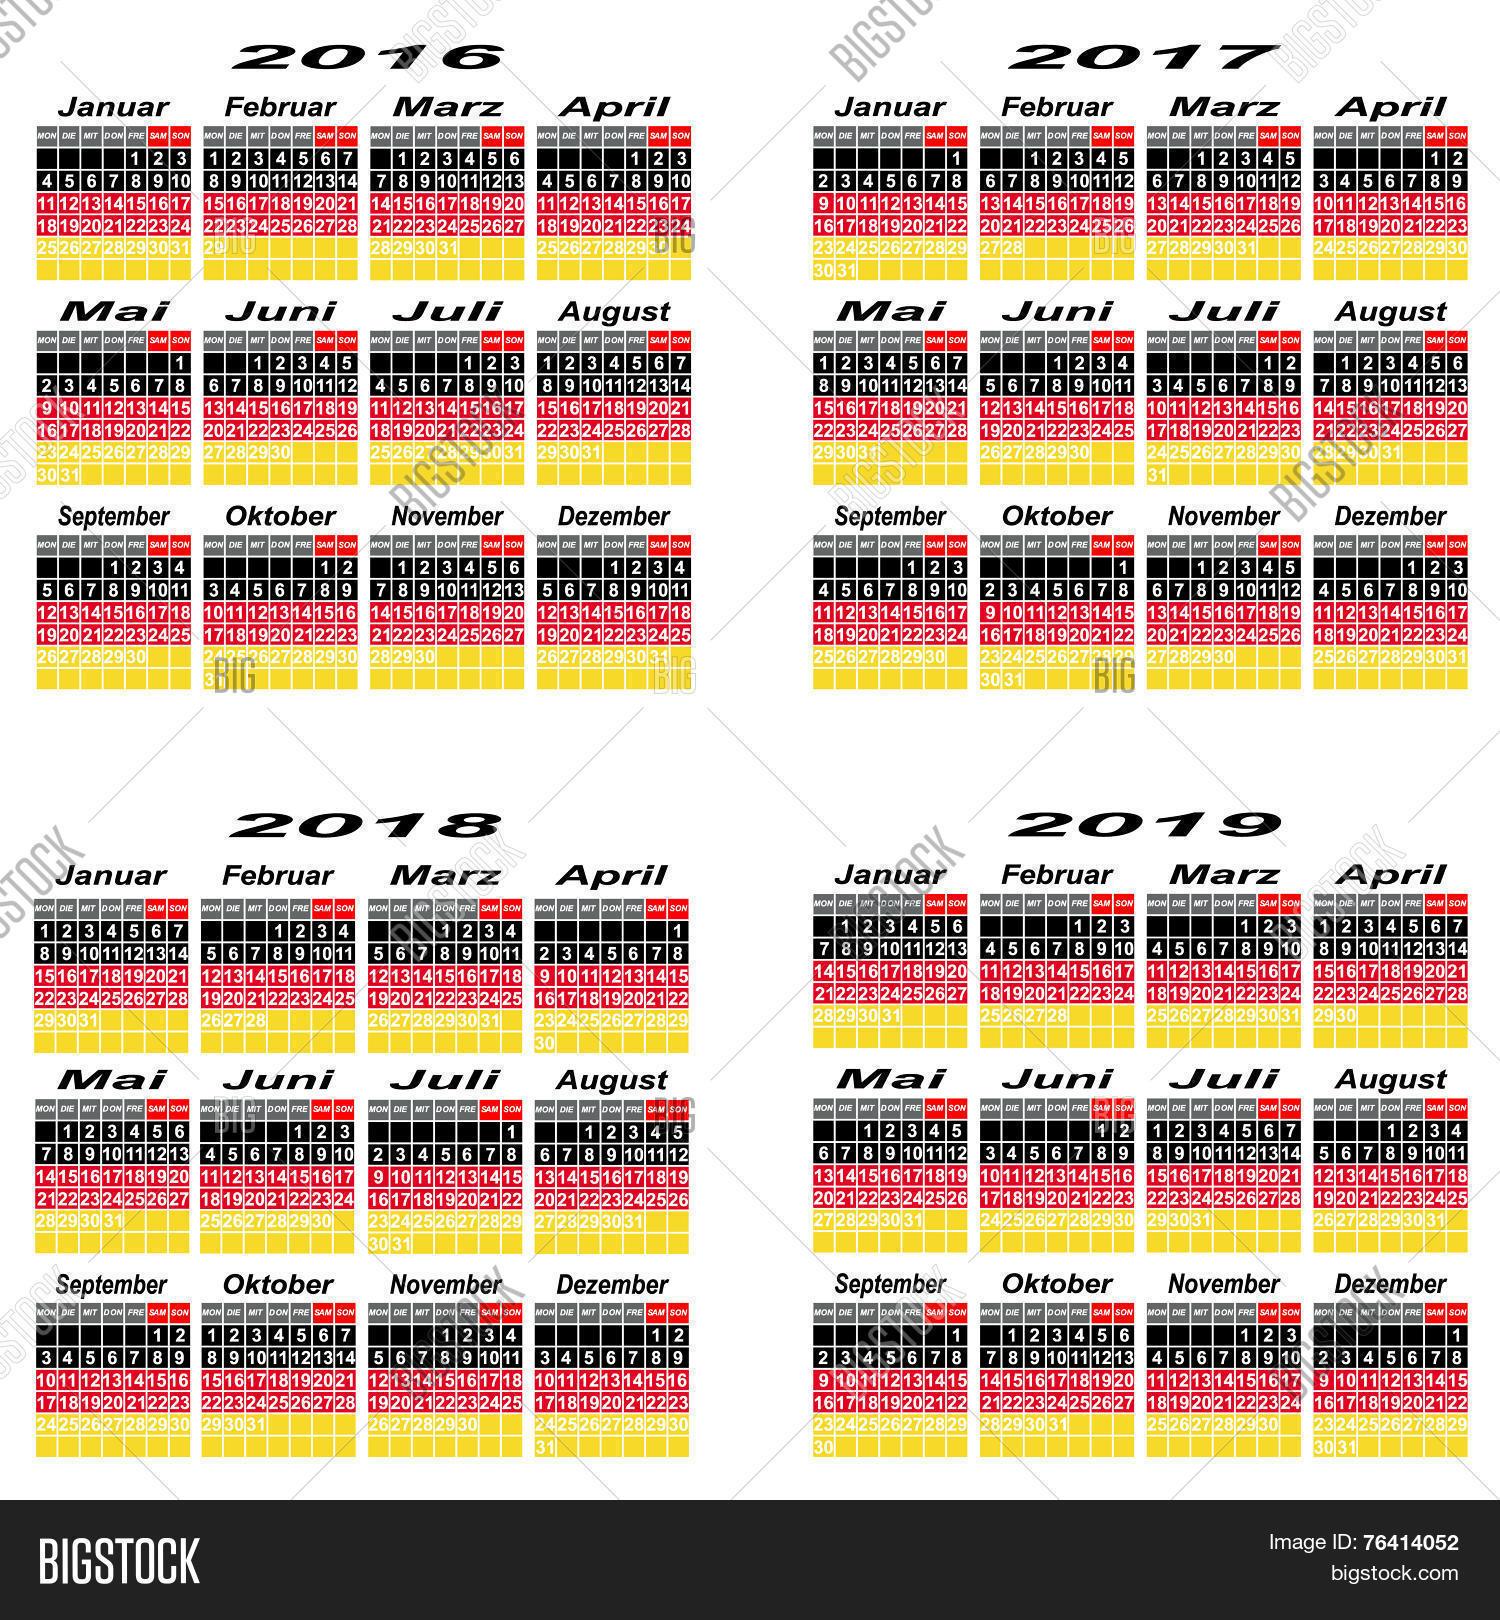 Germany Calendar 2016,2017